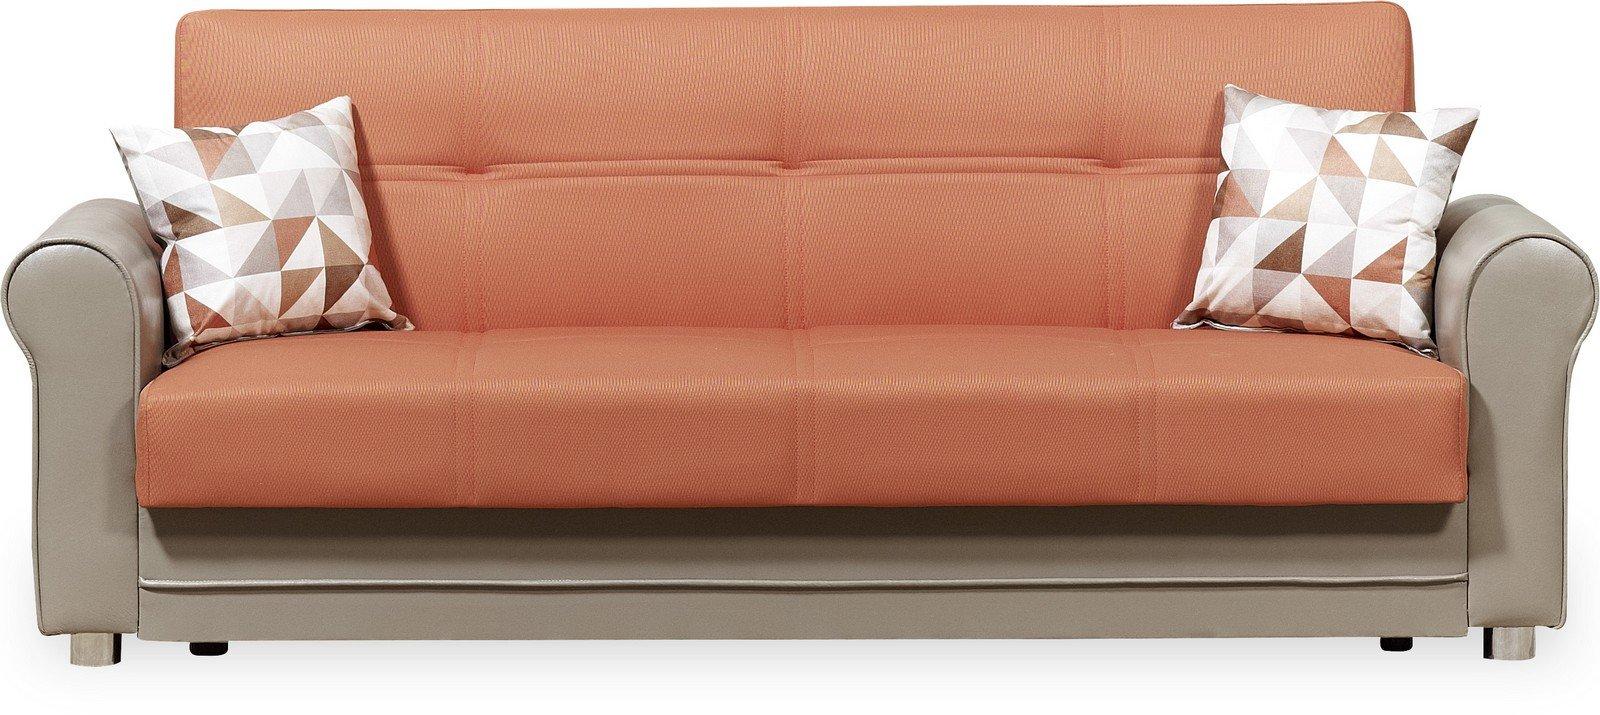 Casamode Avalon Plus Sofa Bed Prusa Orange Polyester